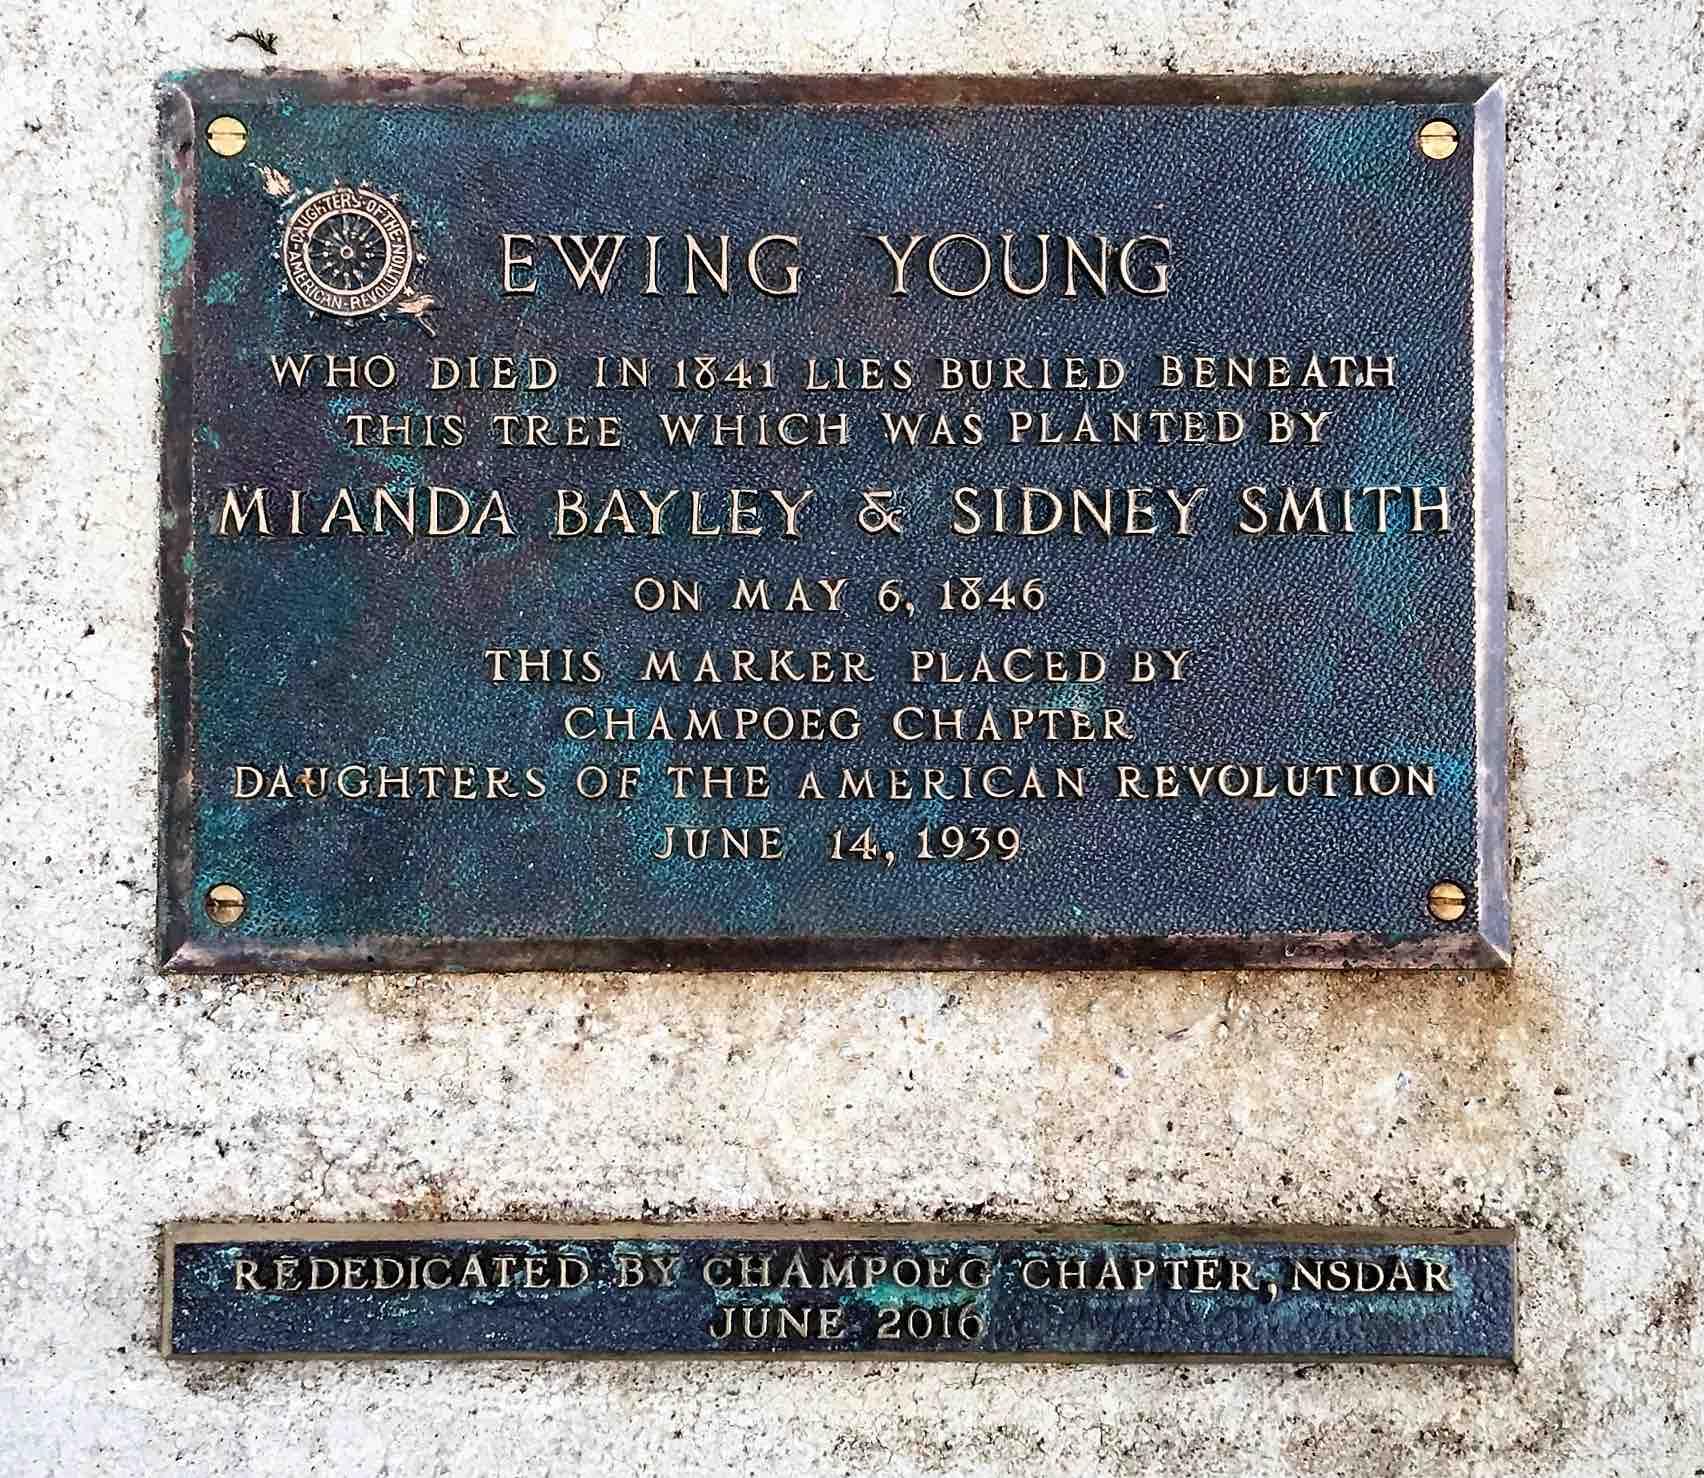 Ewing Young gravestone. (image courtesy of photographer Erica Davis)